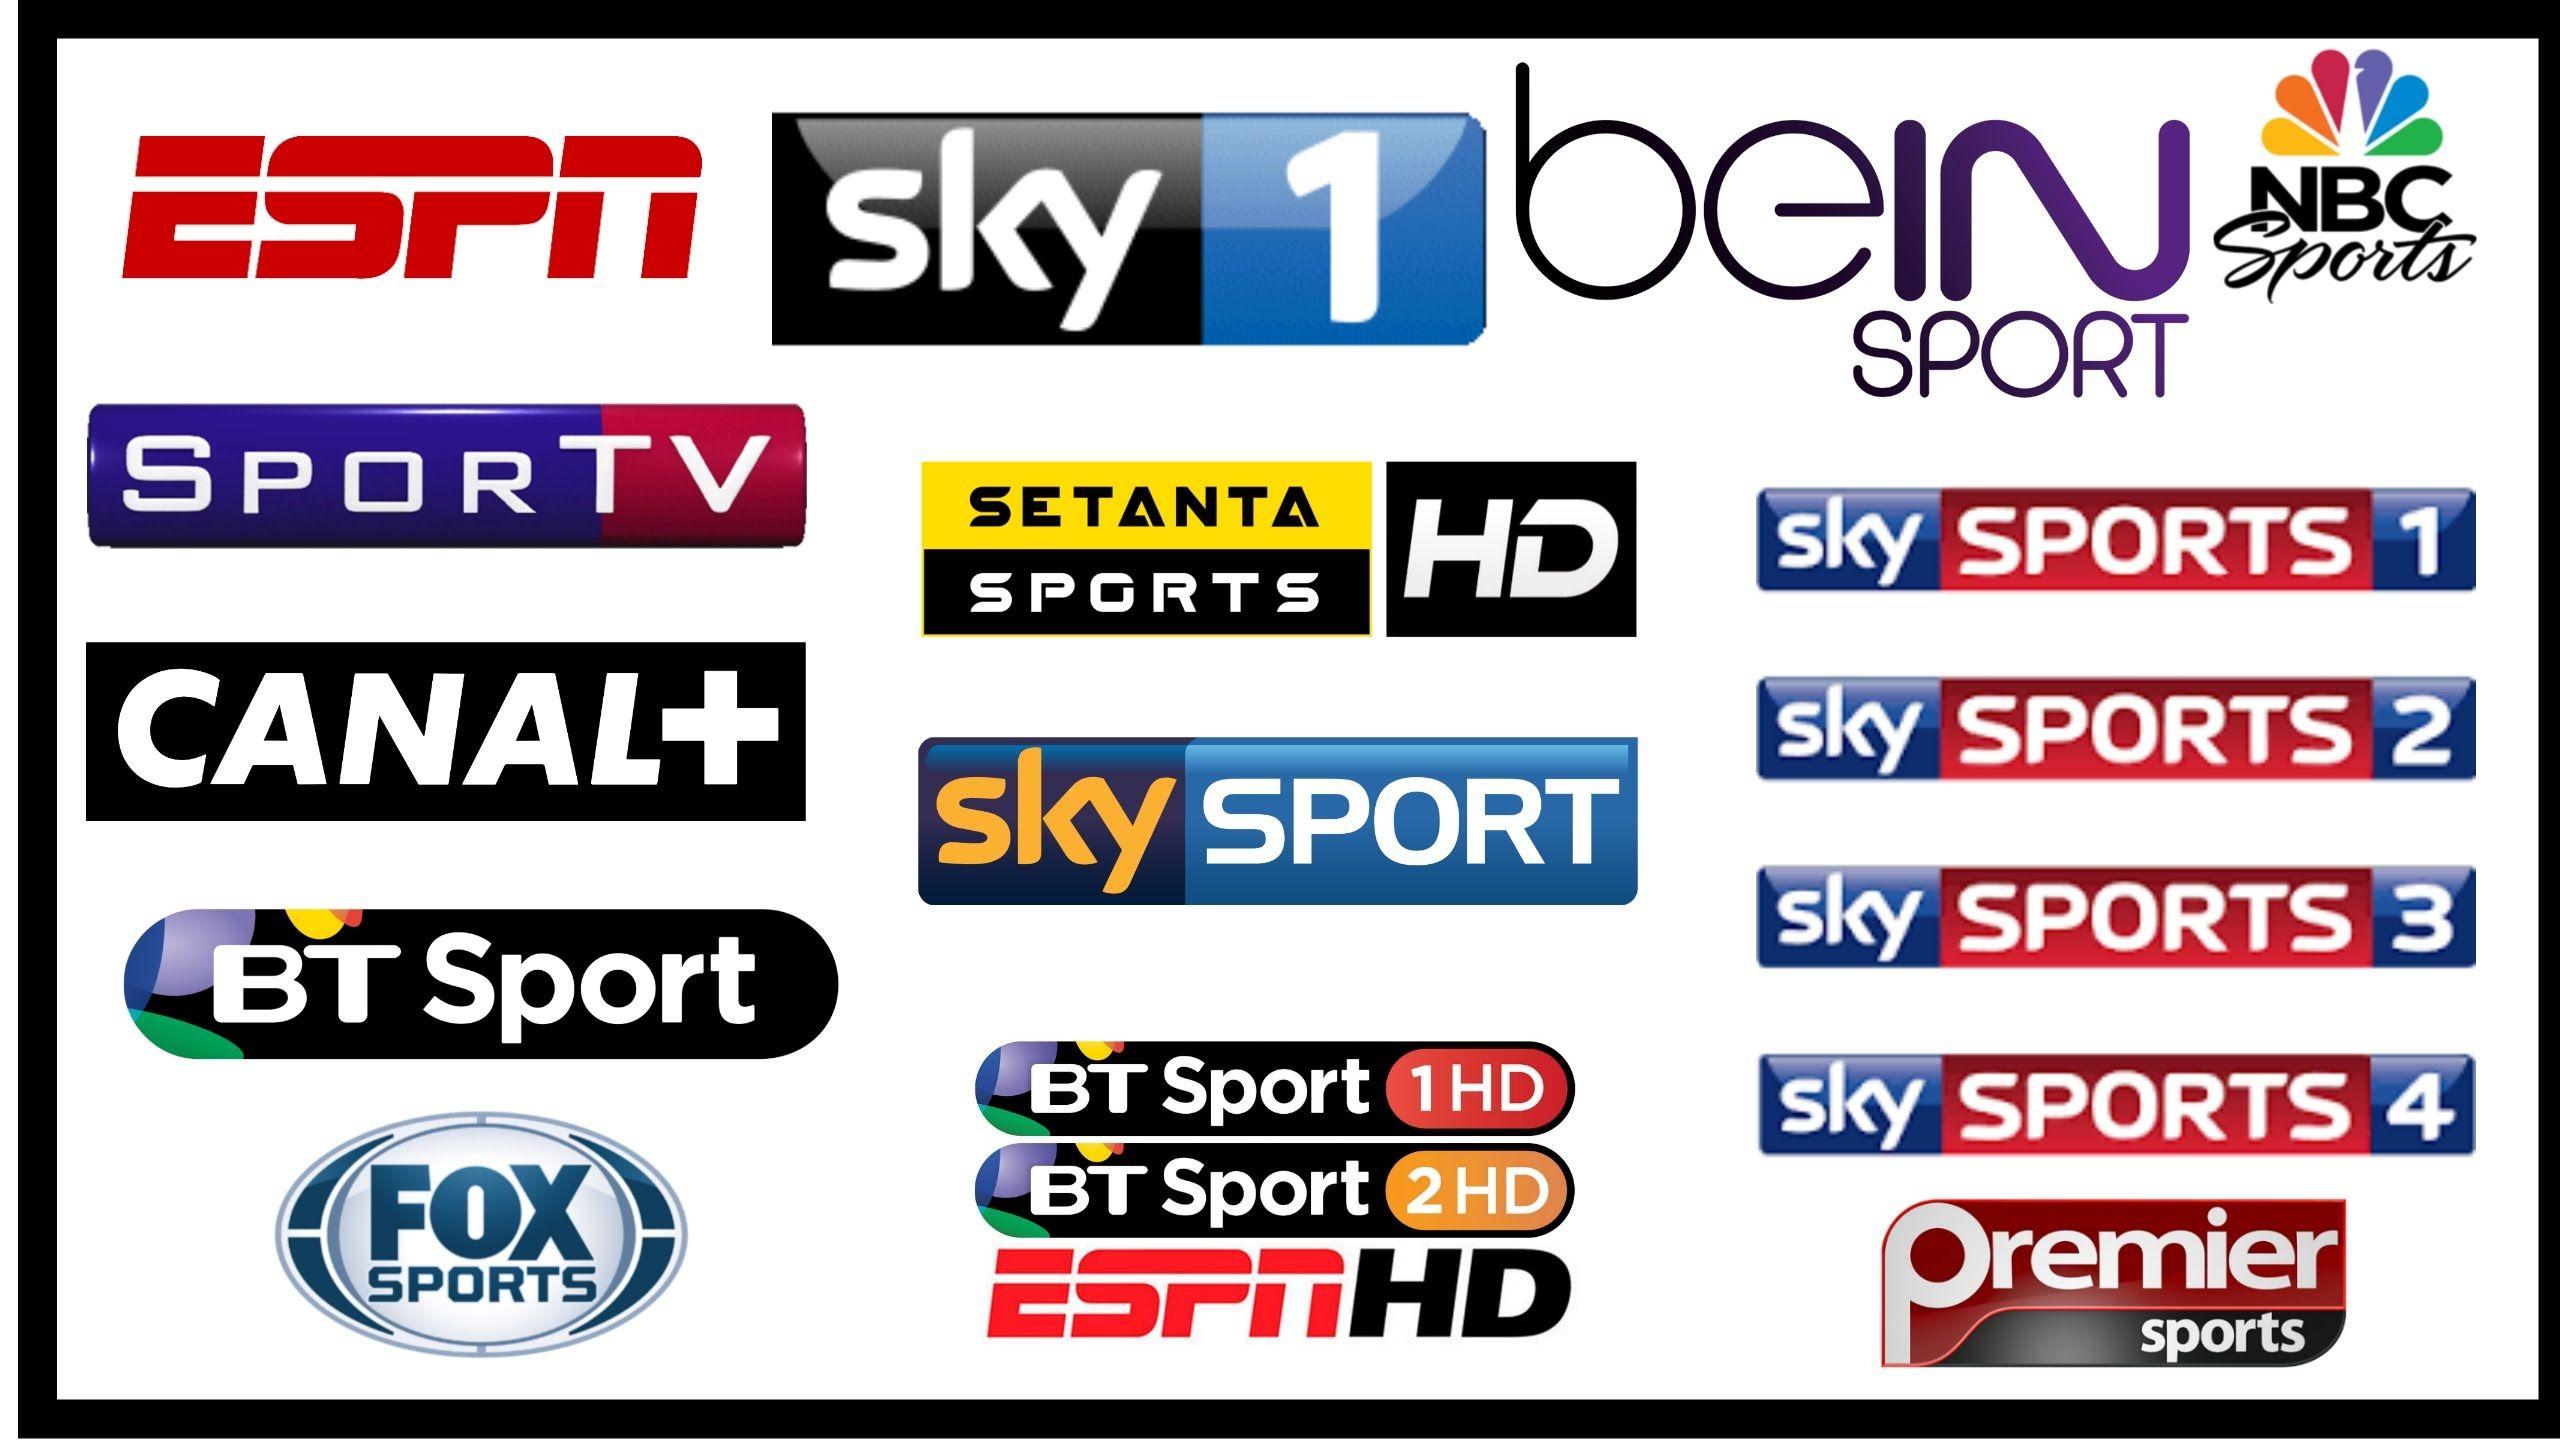 HDTV!! Wilder vs. Stiverne watch free full fight online